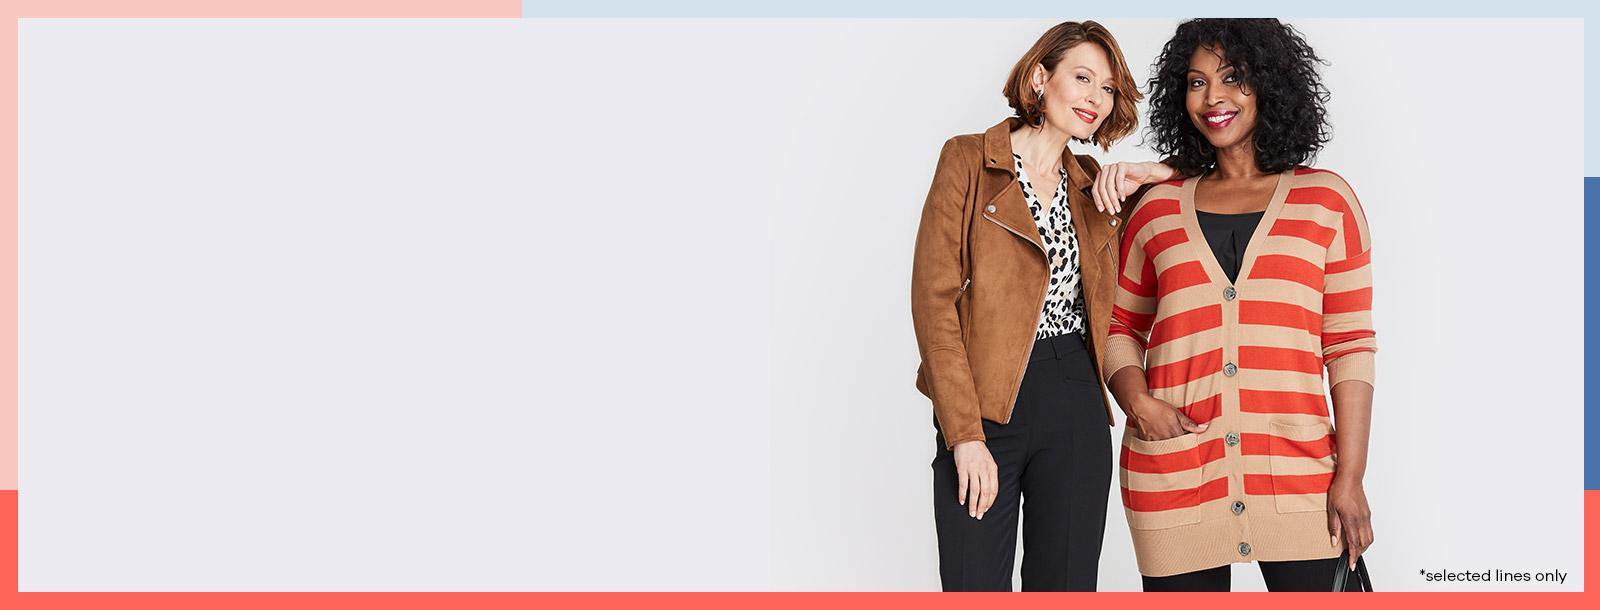 Women's Fashion in Plus Size, menswear, furniture, homewares